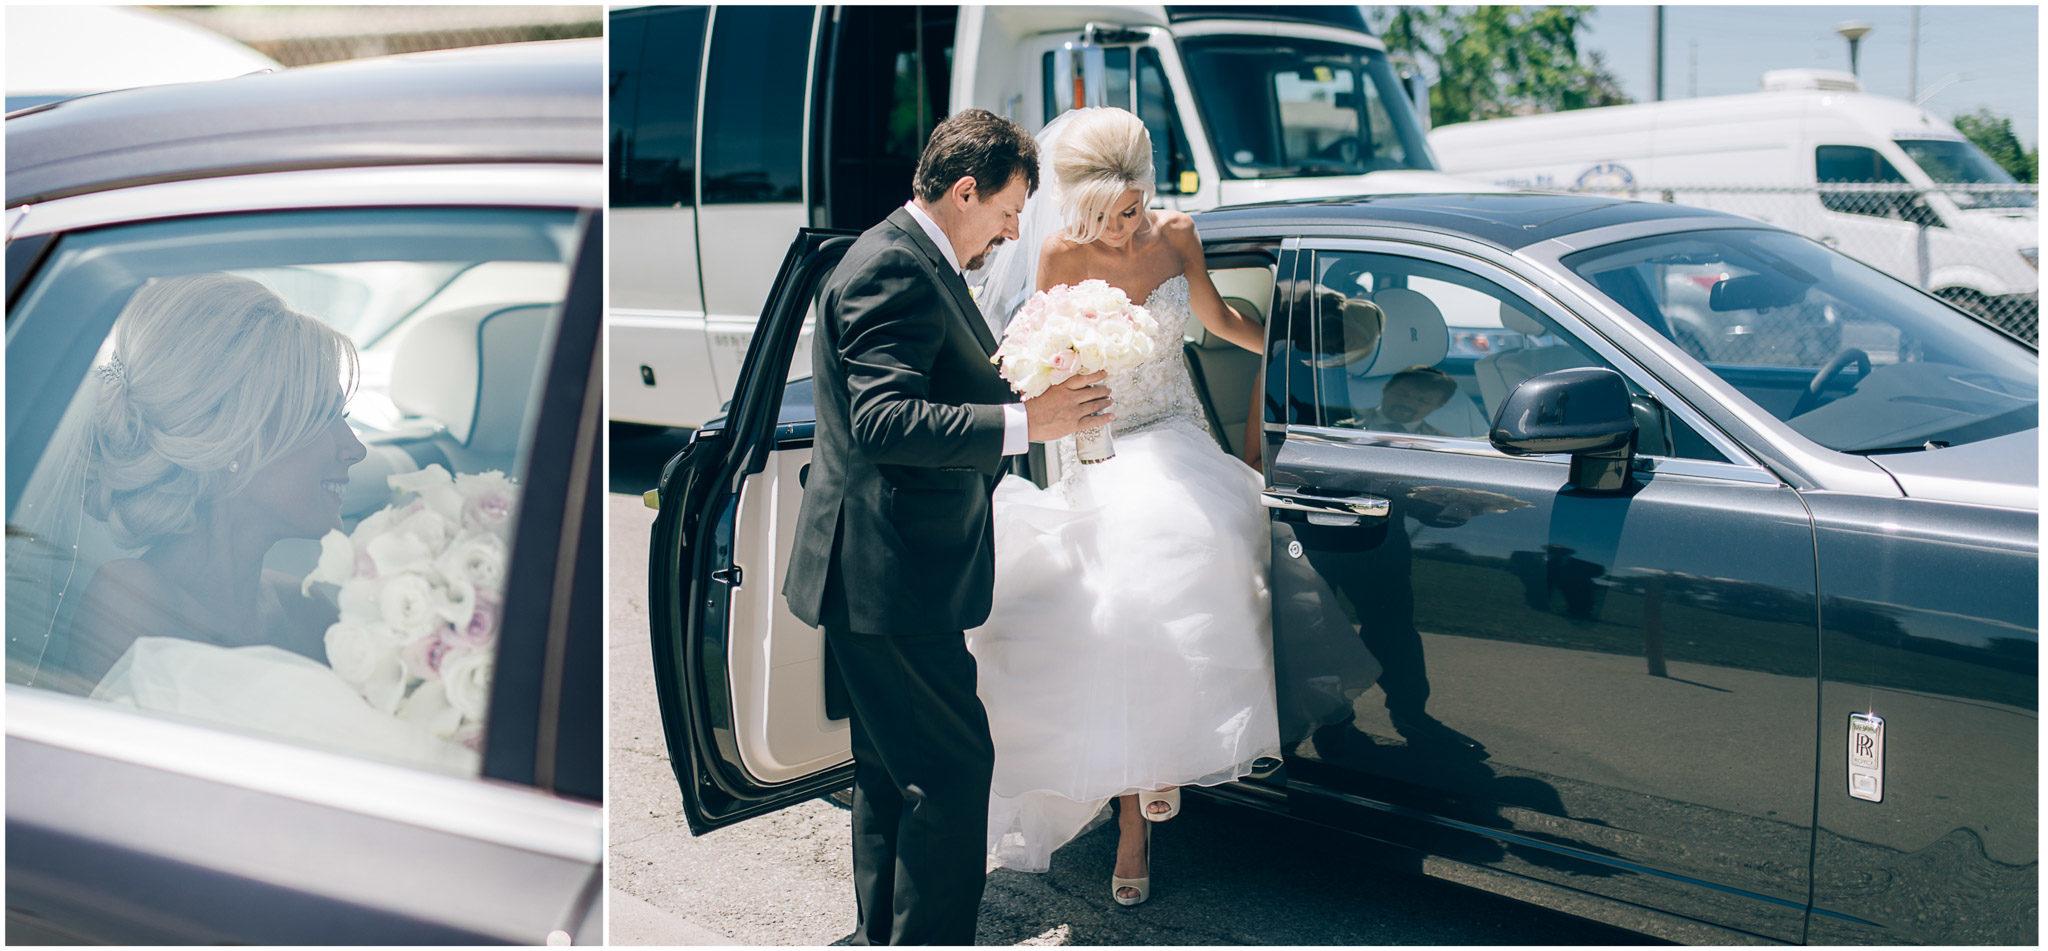 ukrainian-wedding-rolls-royce-limousine-exit